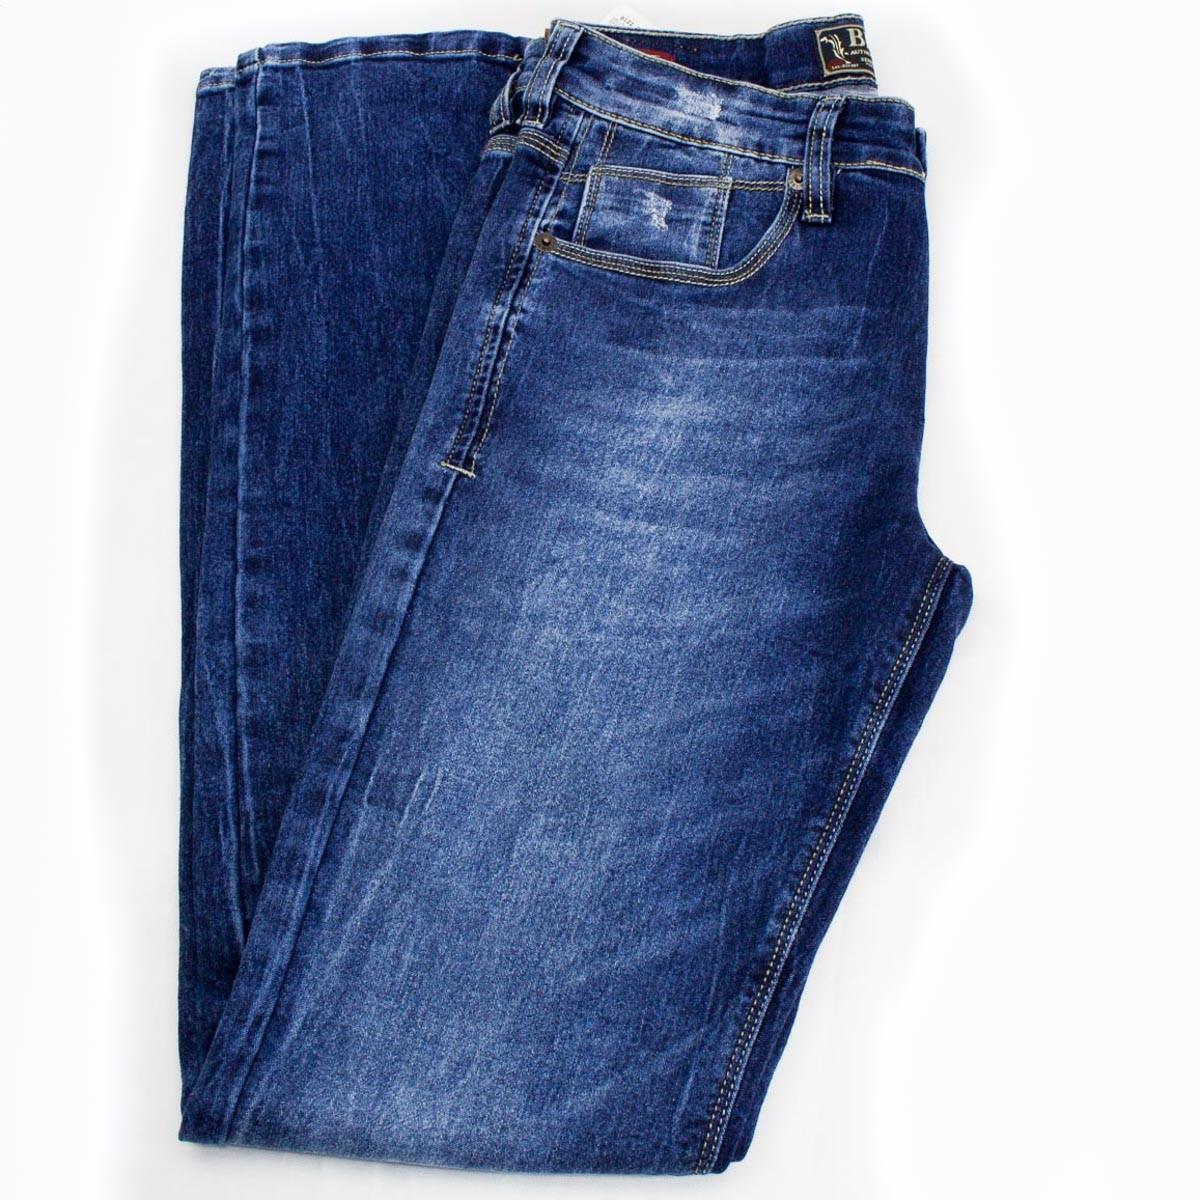 344abc3e9 Imagem - Calça Jeans Masculina Beagle 033407 - 043582